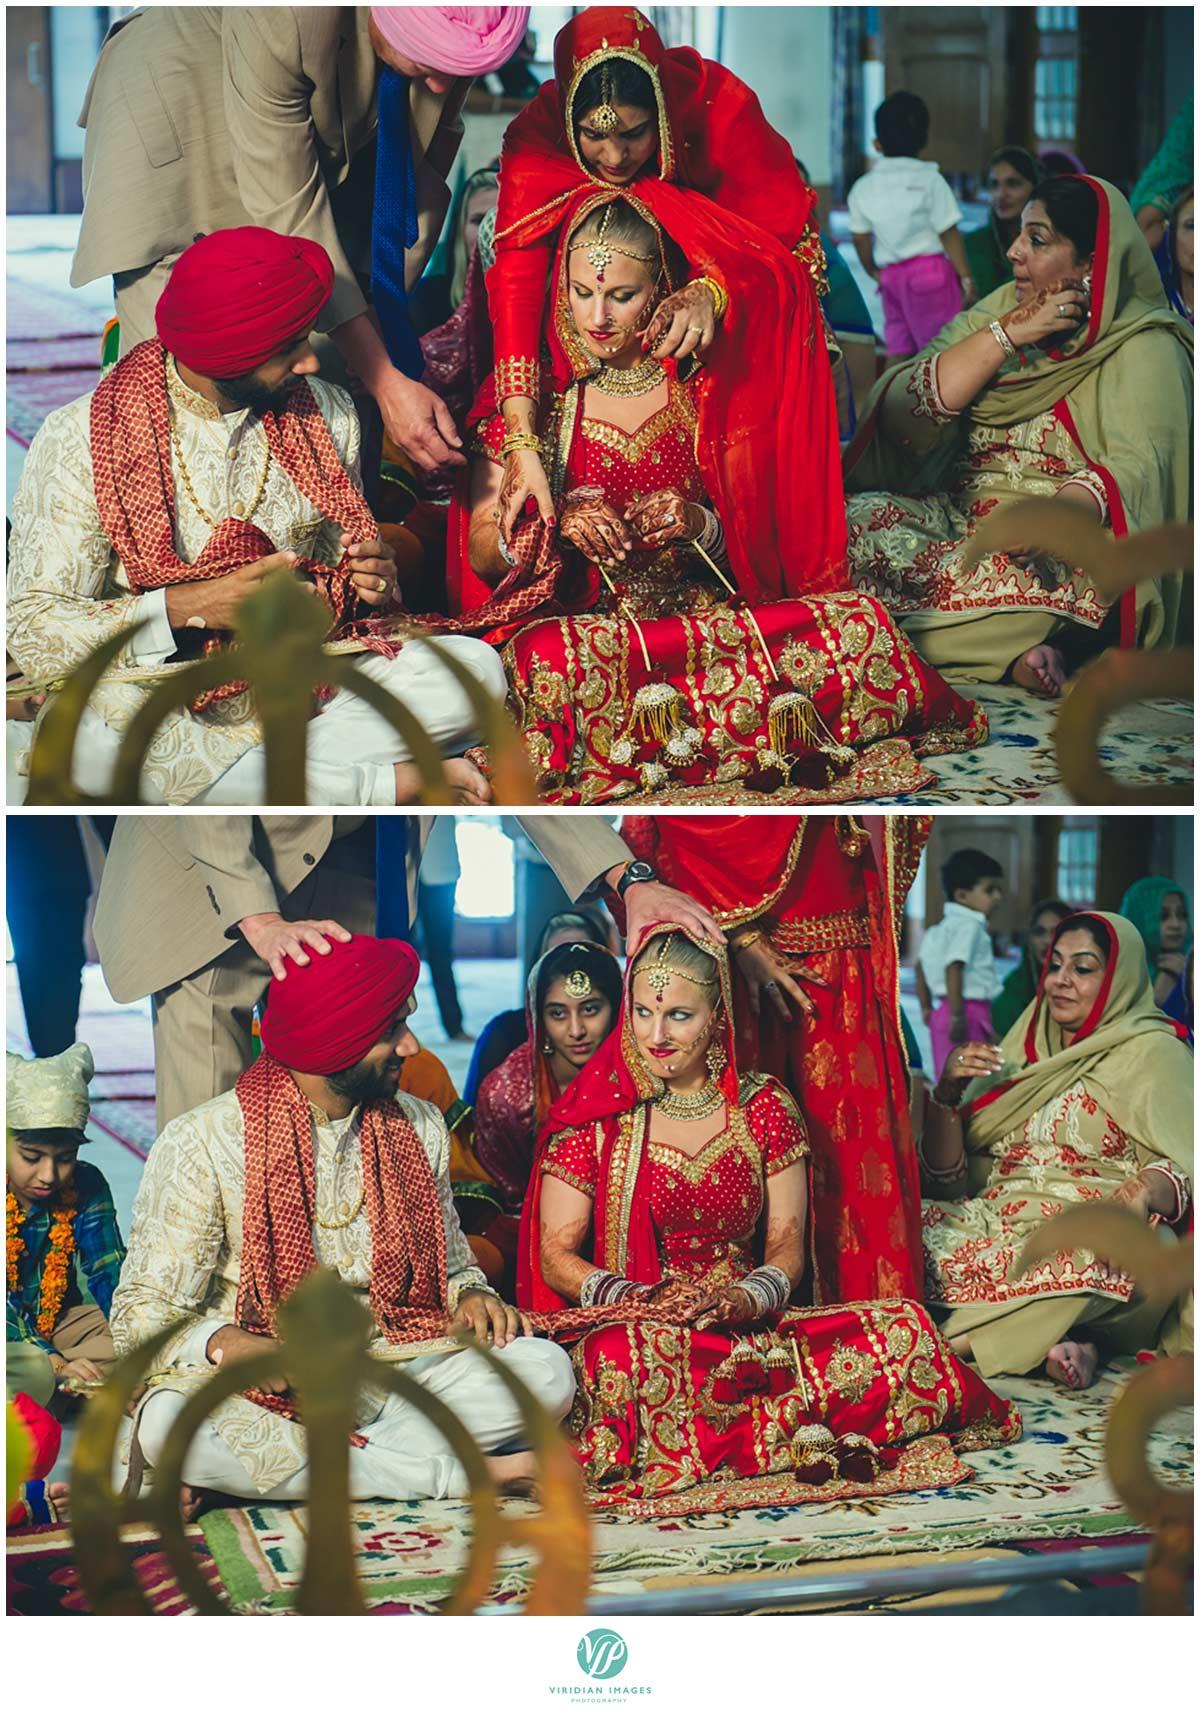 India_Chandigarh_Wedding_Viridian_Images_Photography_poto_23